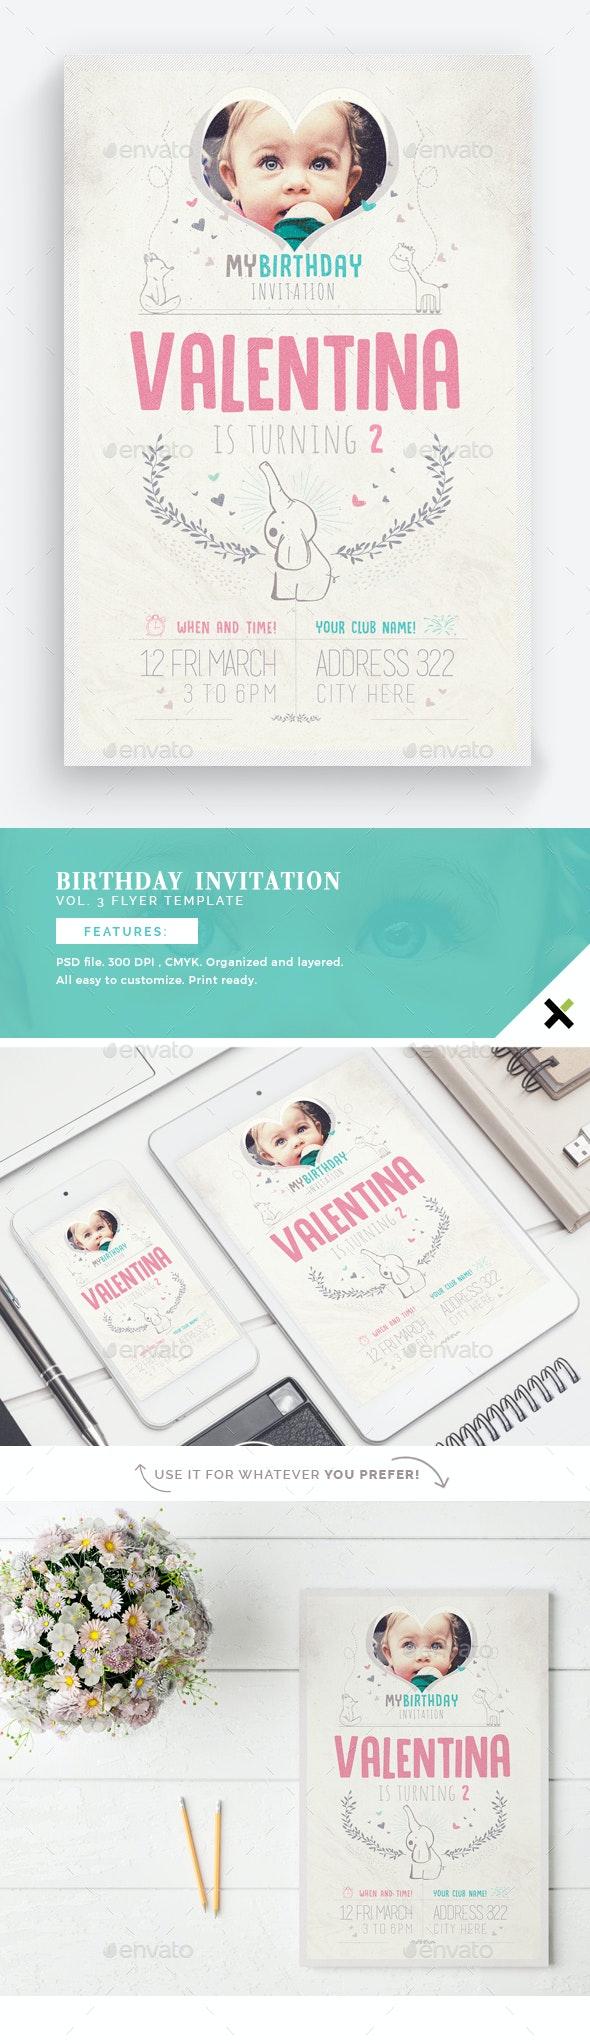 Birthday Invitation Vol.3 Flyer Template - Birthday Greeting Cards